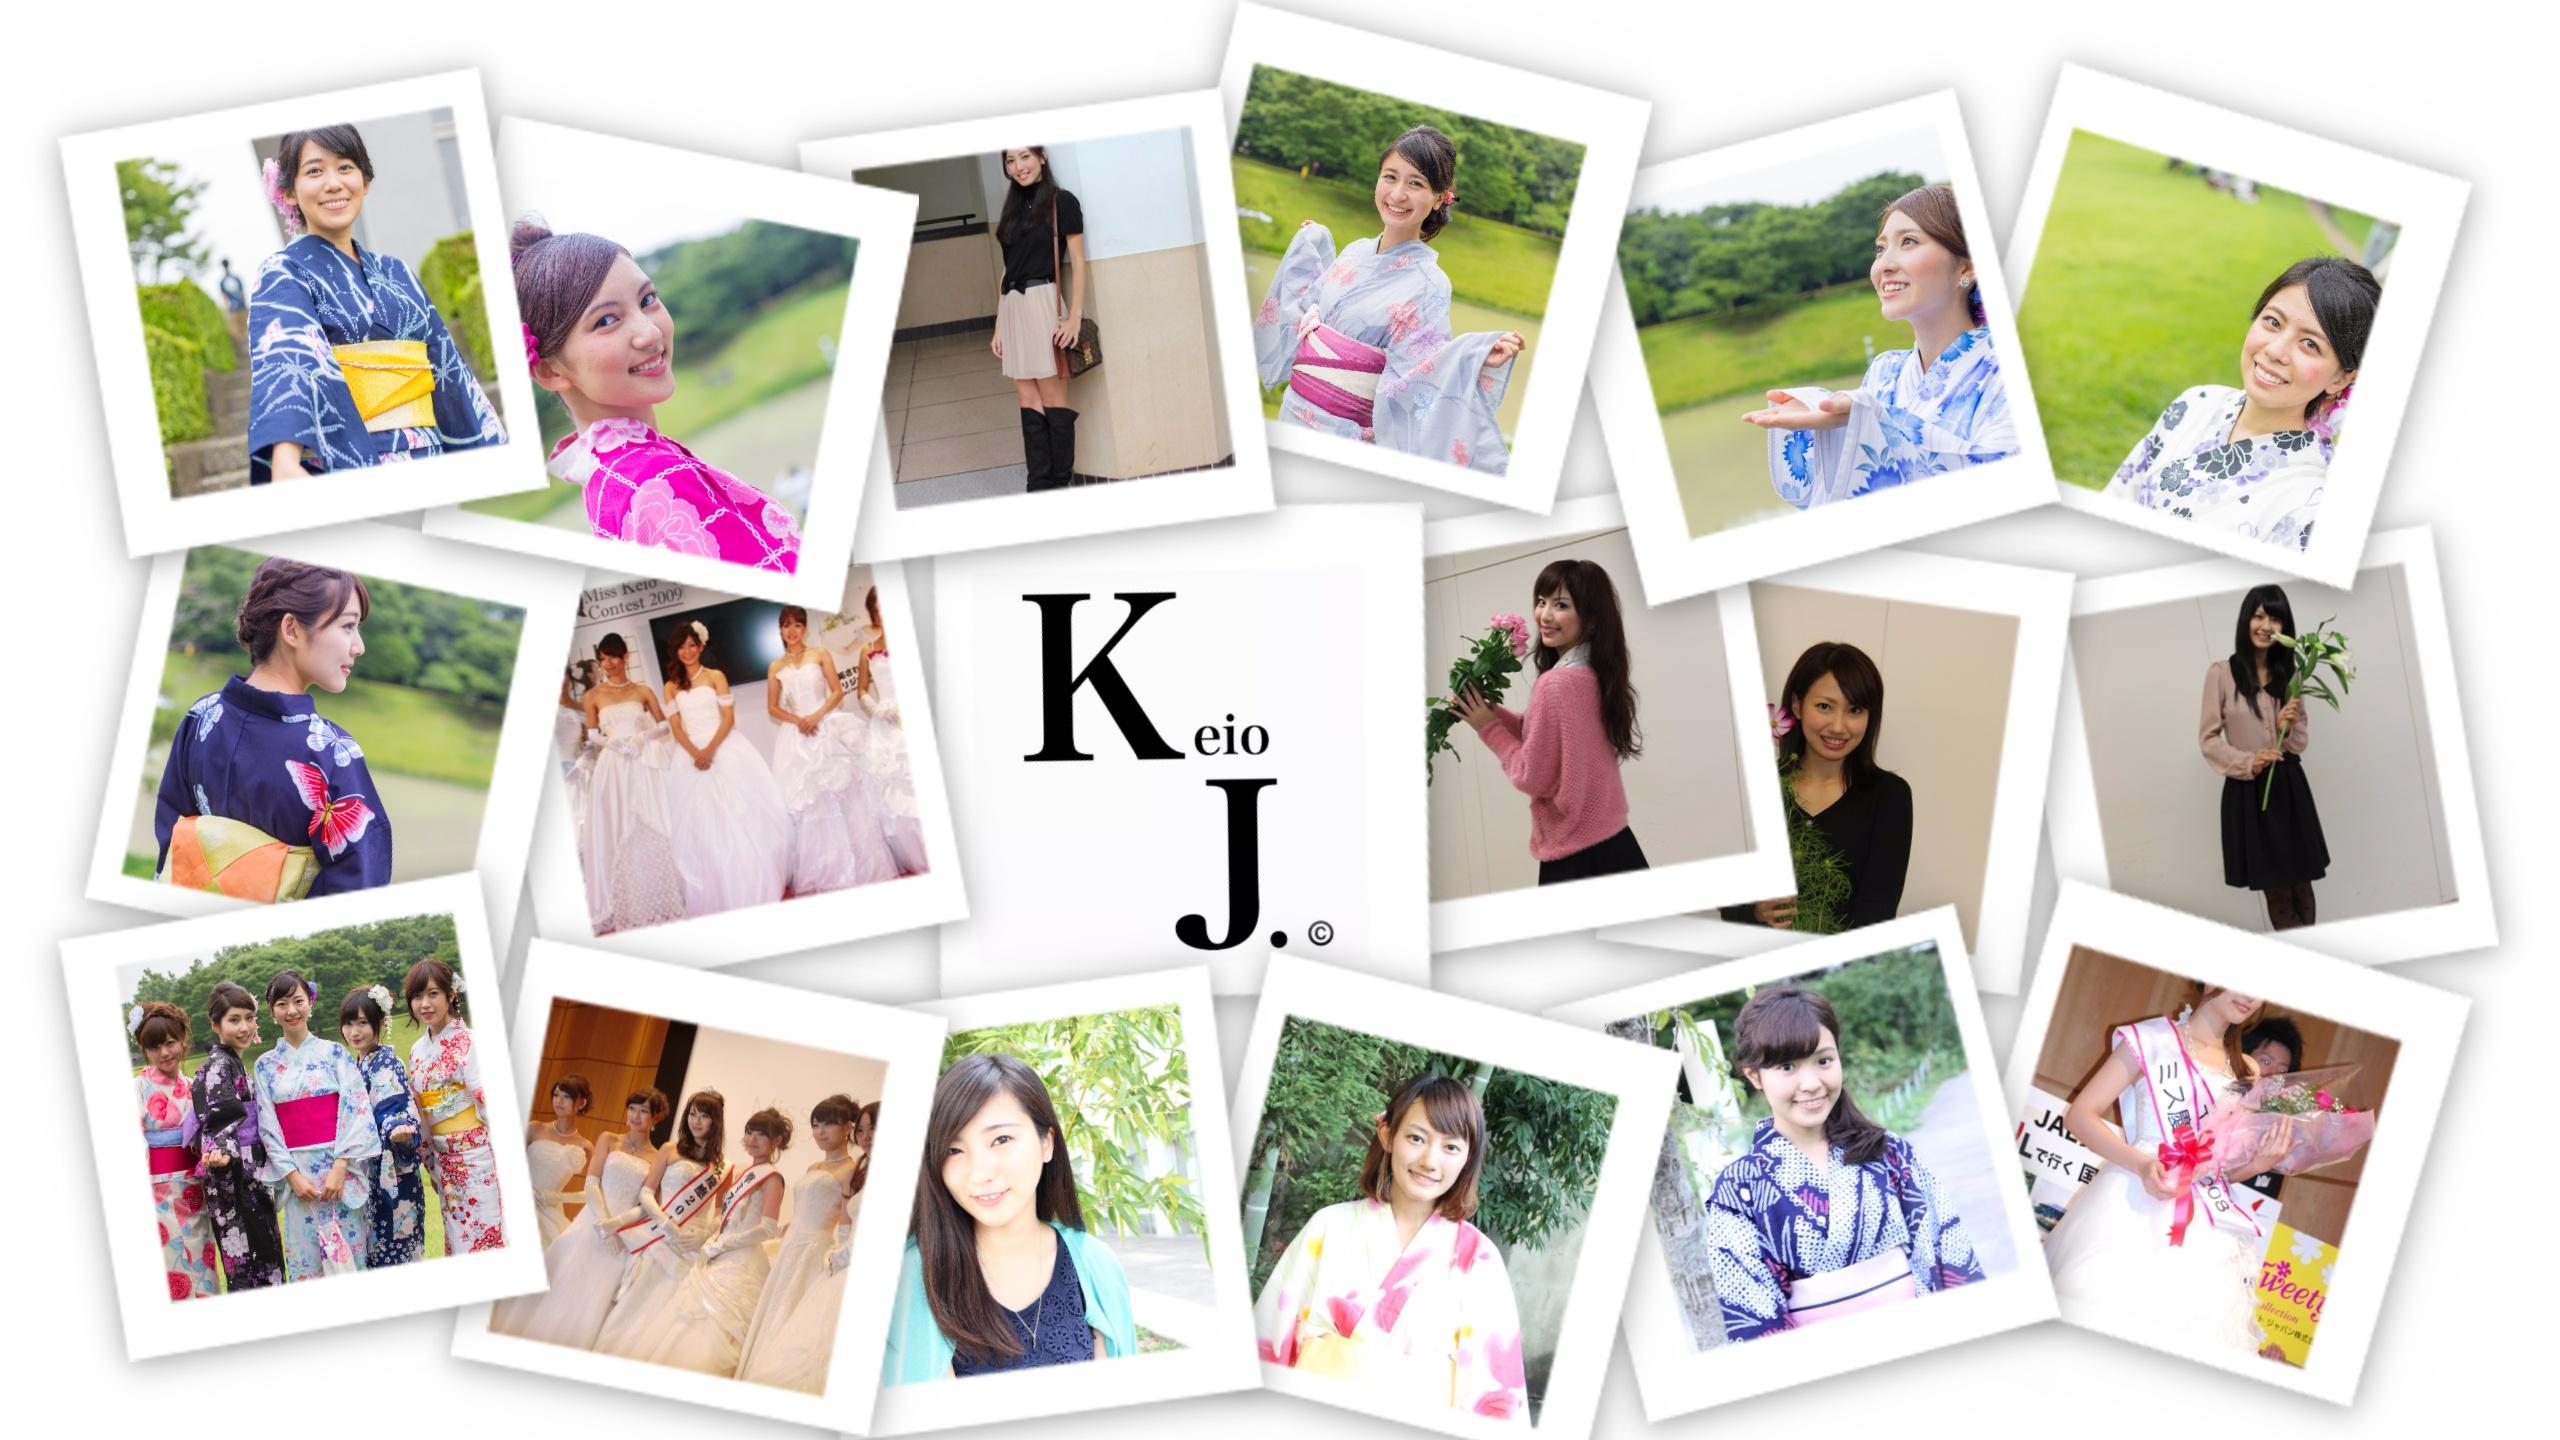 Miss KJ Contest